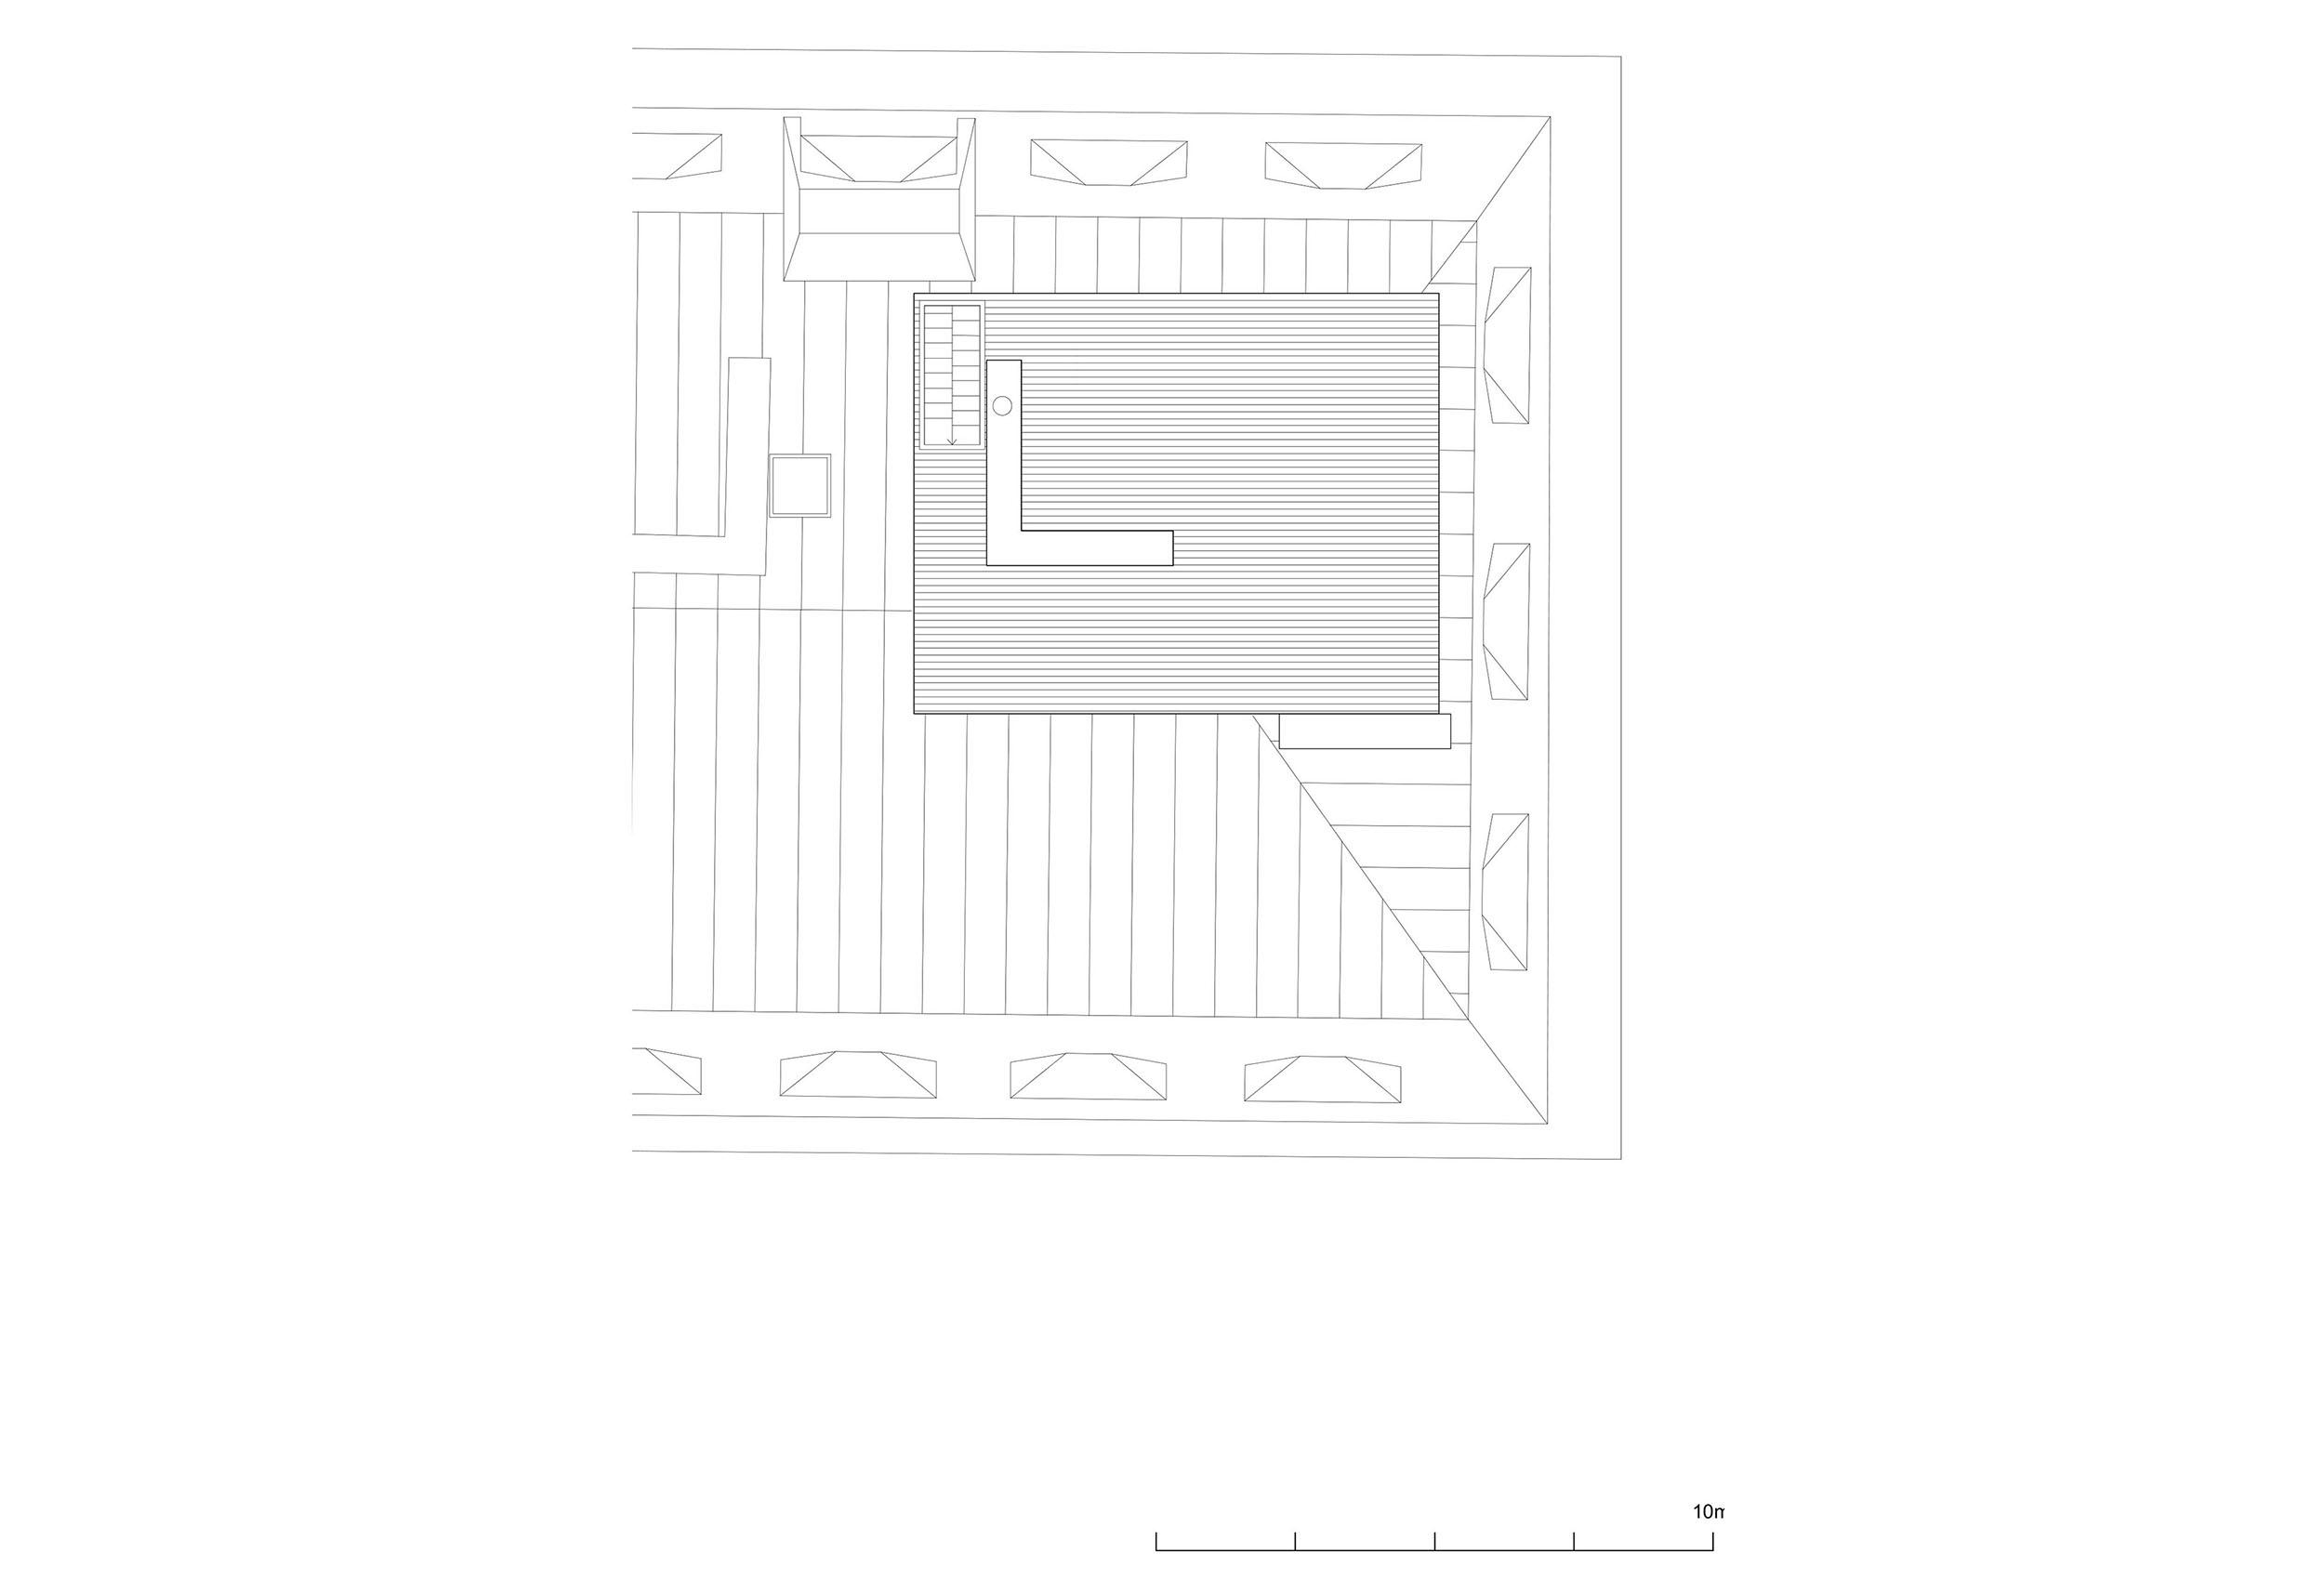 GRA_Plan_Publication__01.05.17_TY